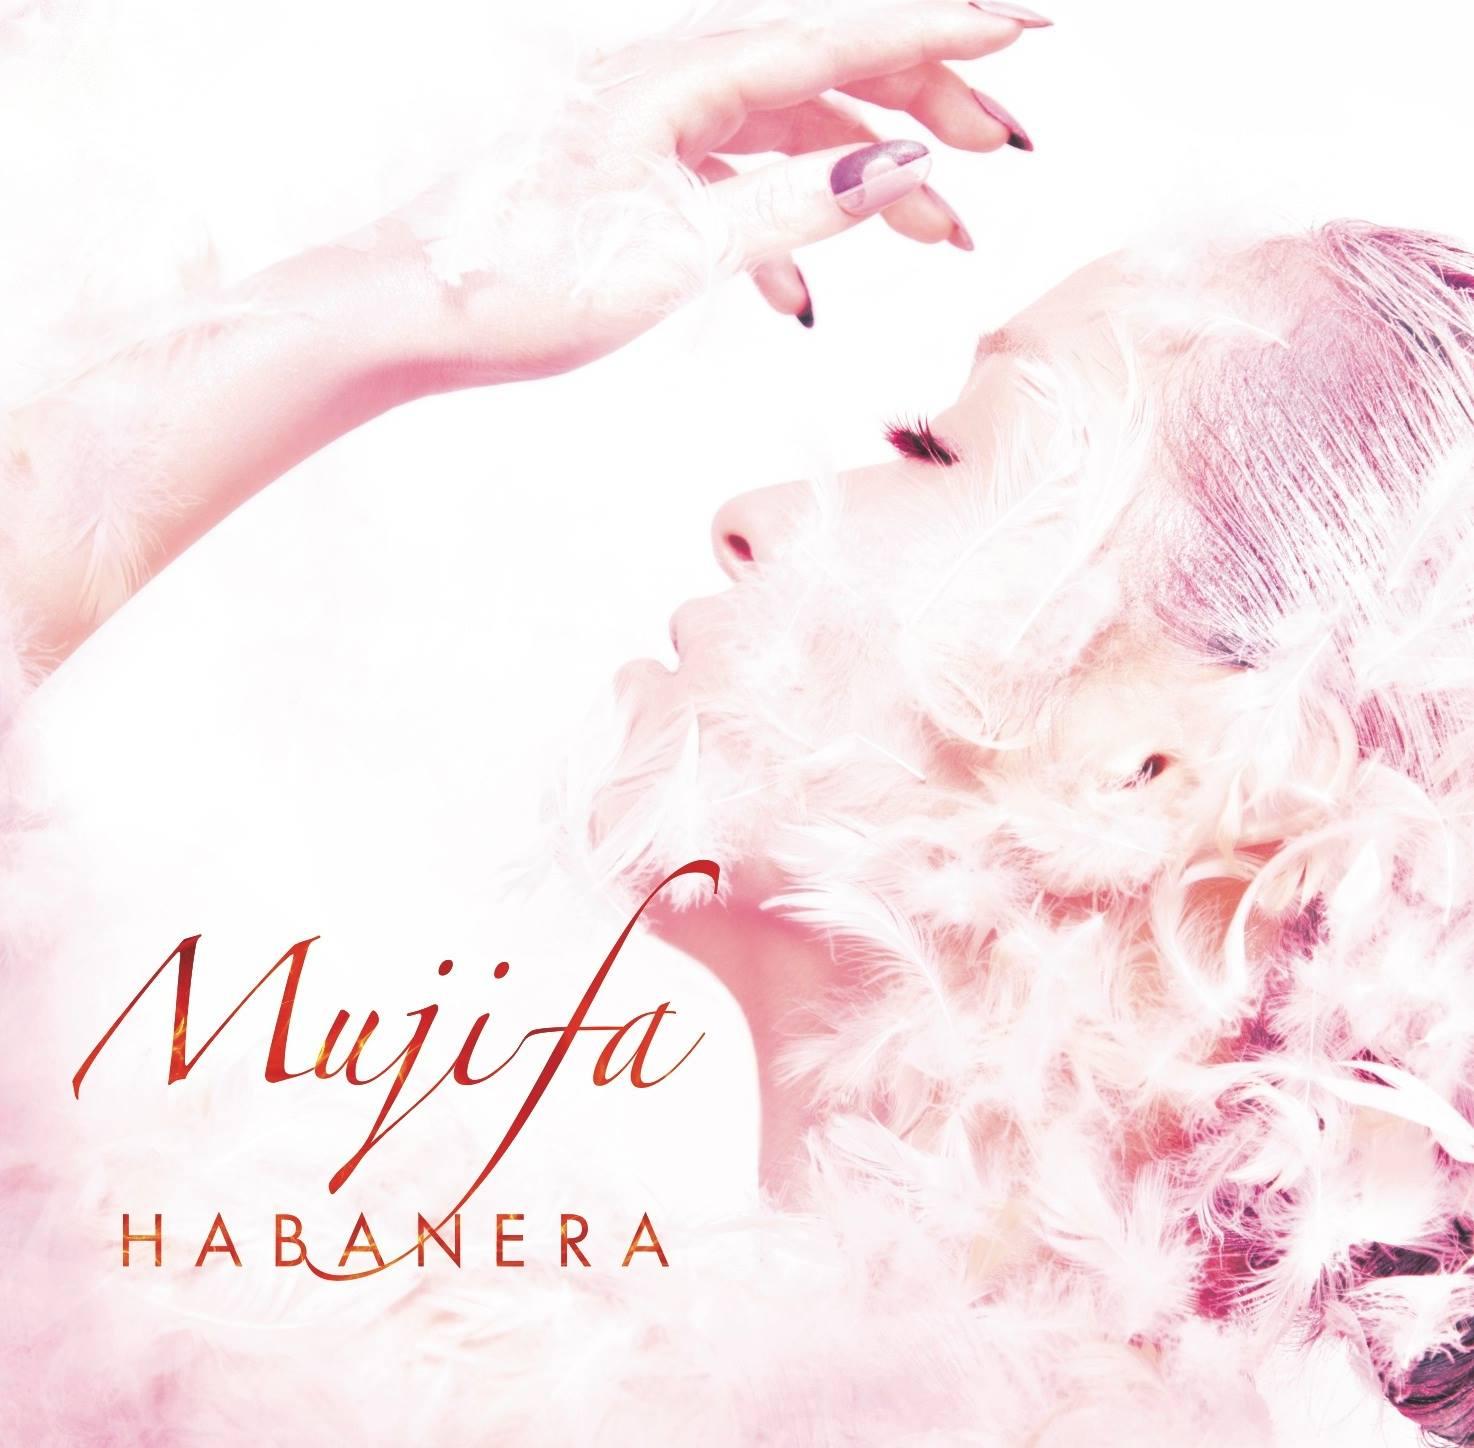 Mujifa メジャーデビューシングル『HABANERA』